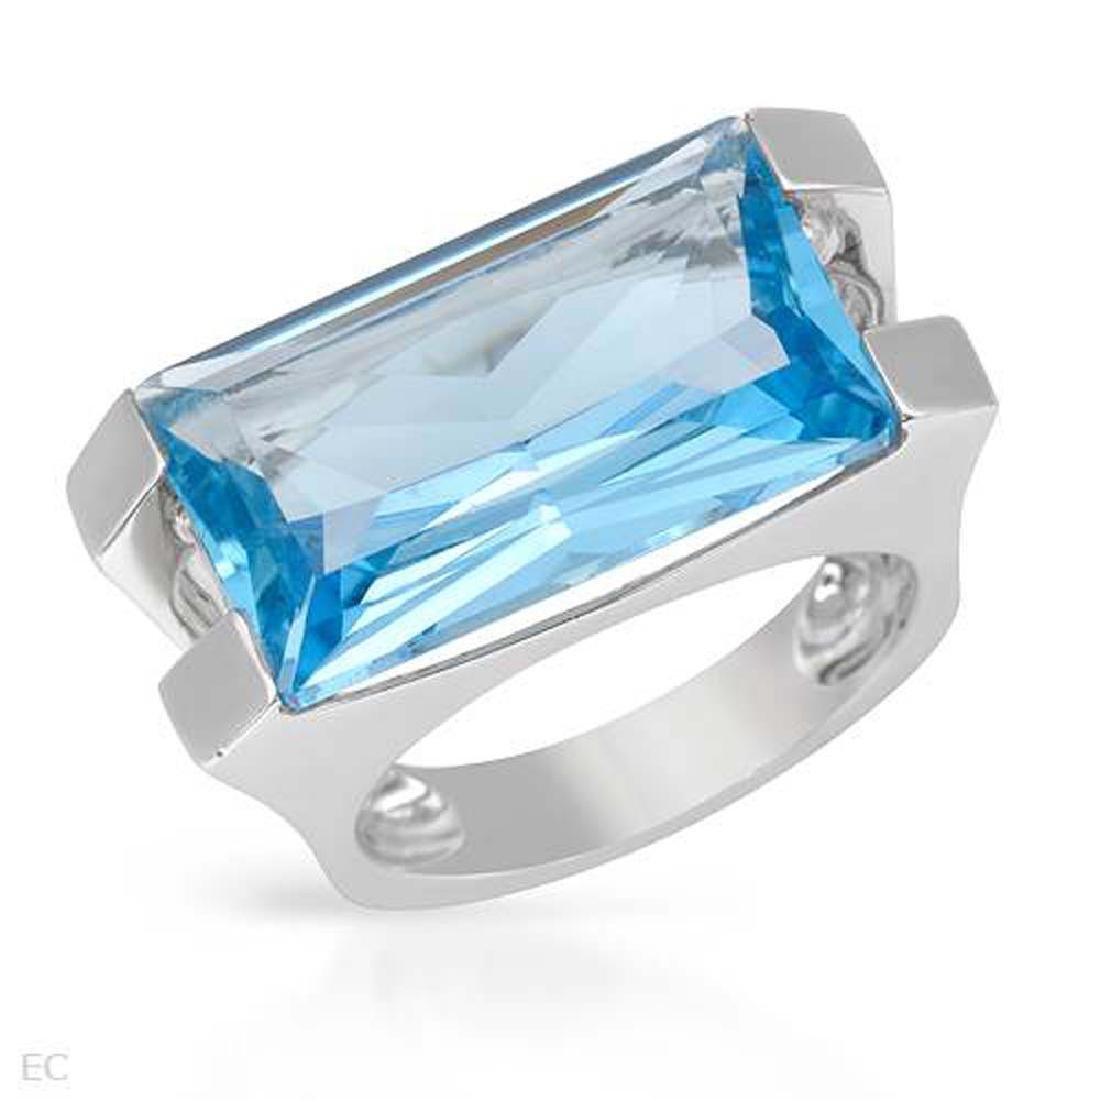 14.33 CTW Topaz Fashion  Ring in 14K White Gold